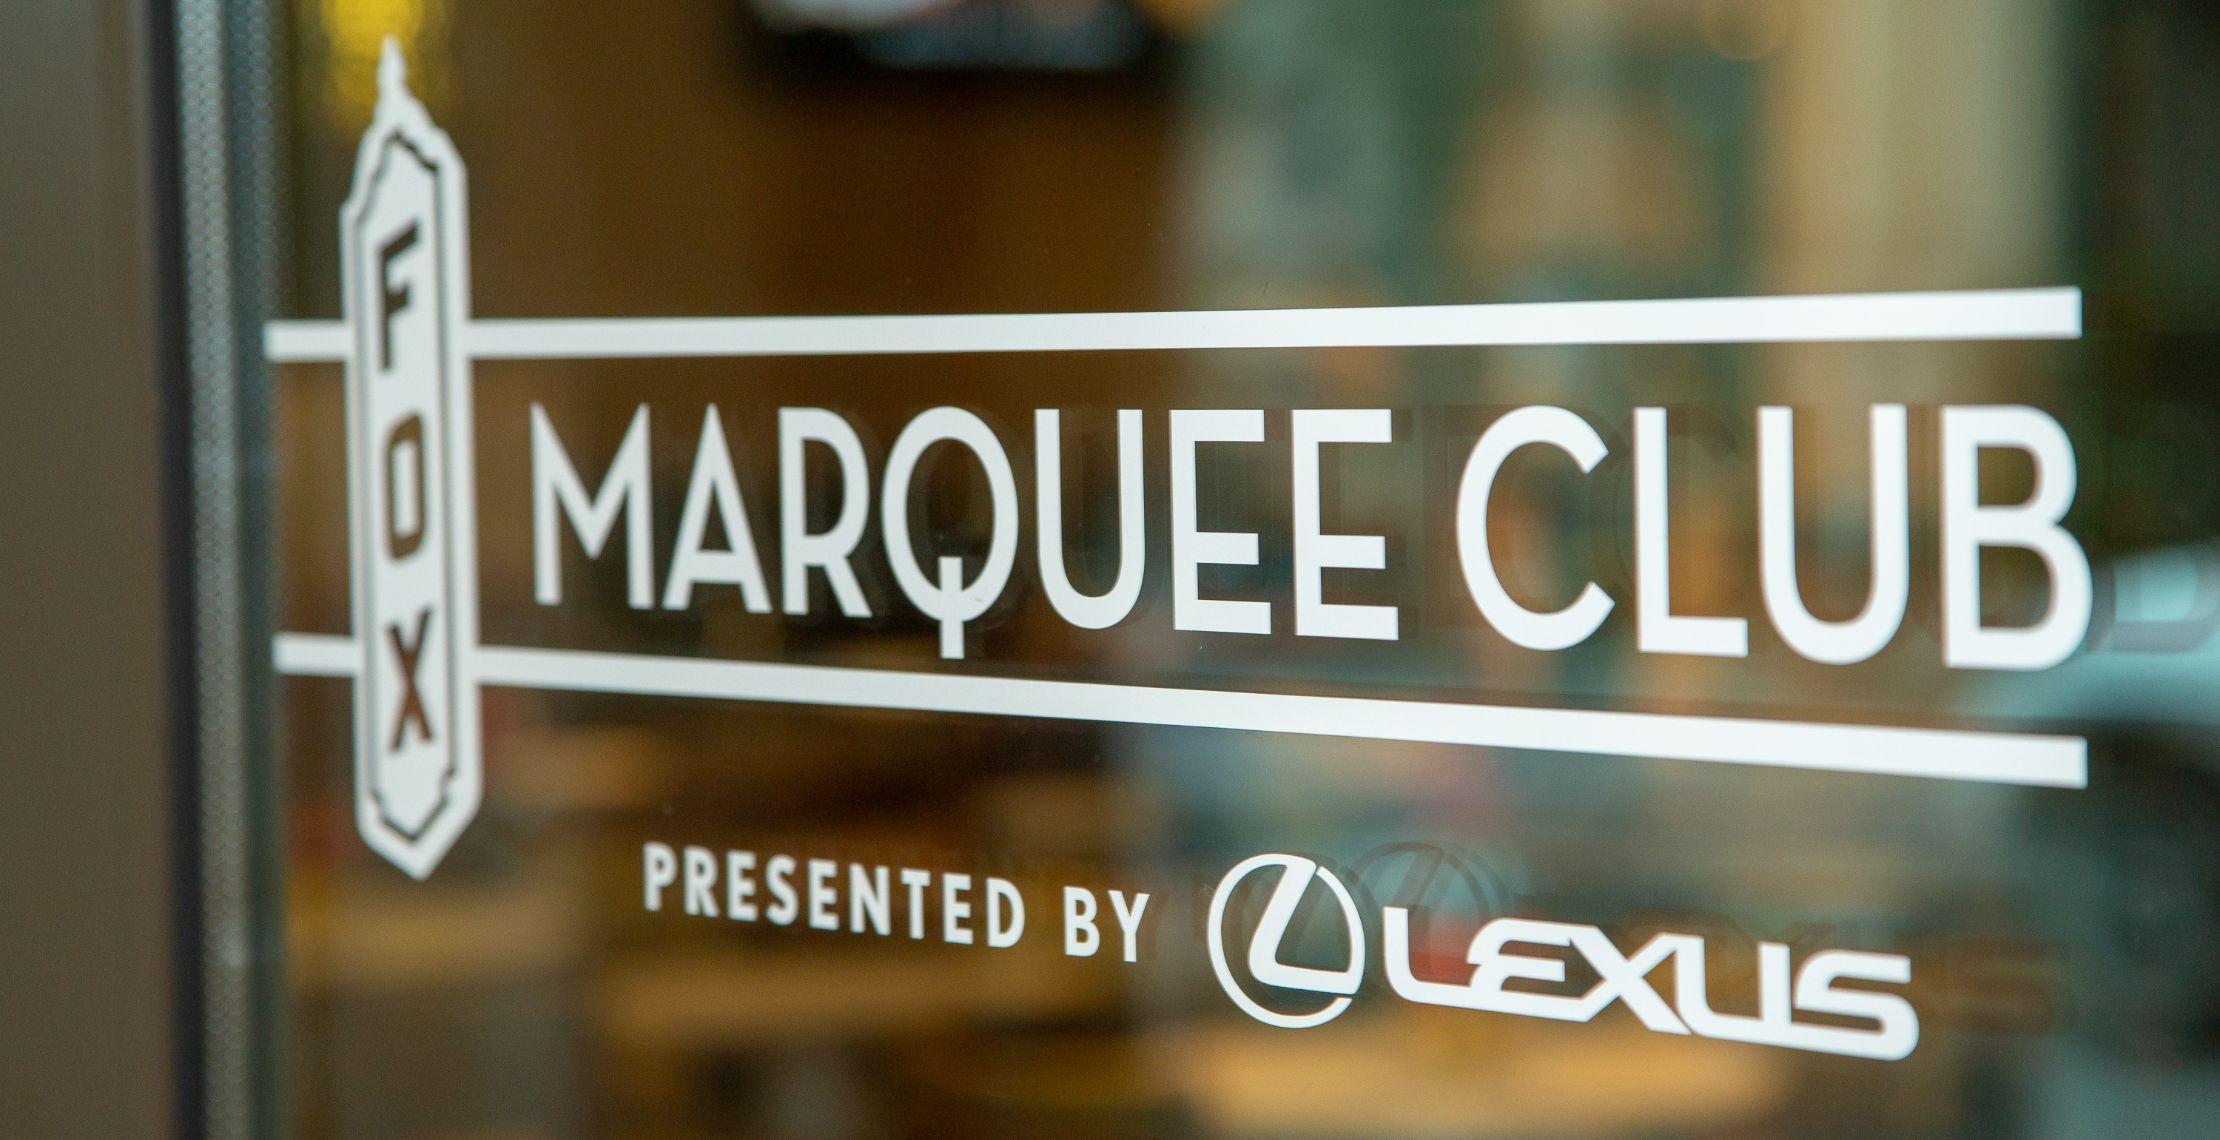 Marquee club presented by lexus fox theatre